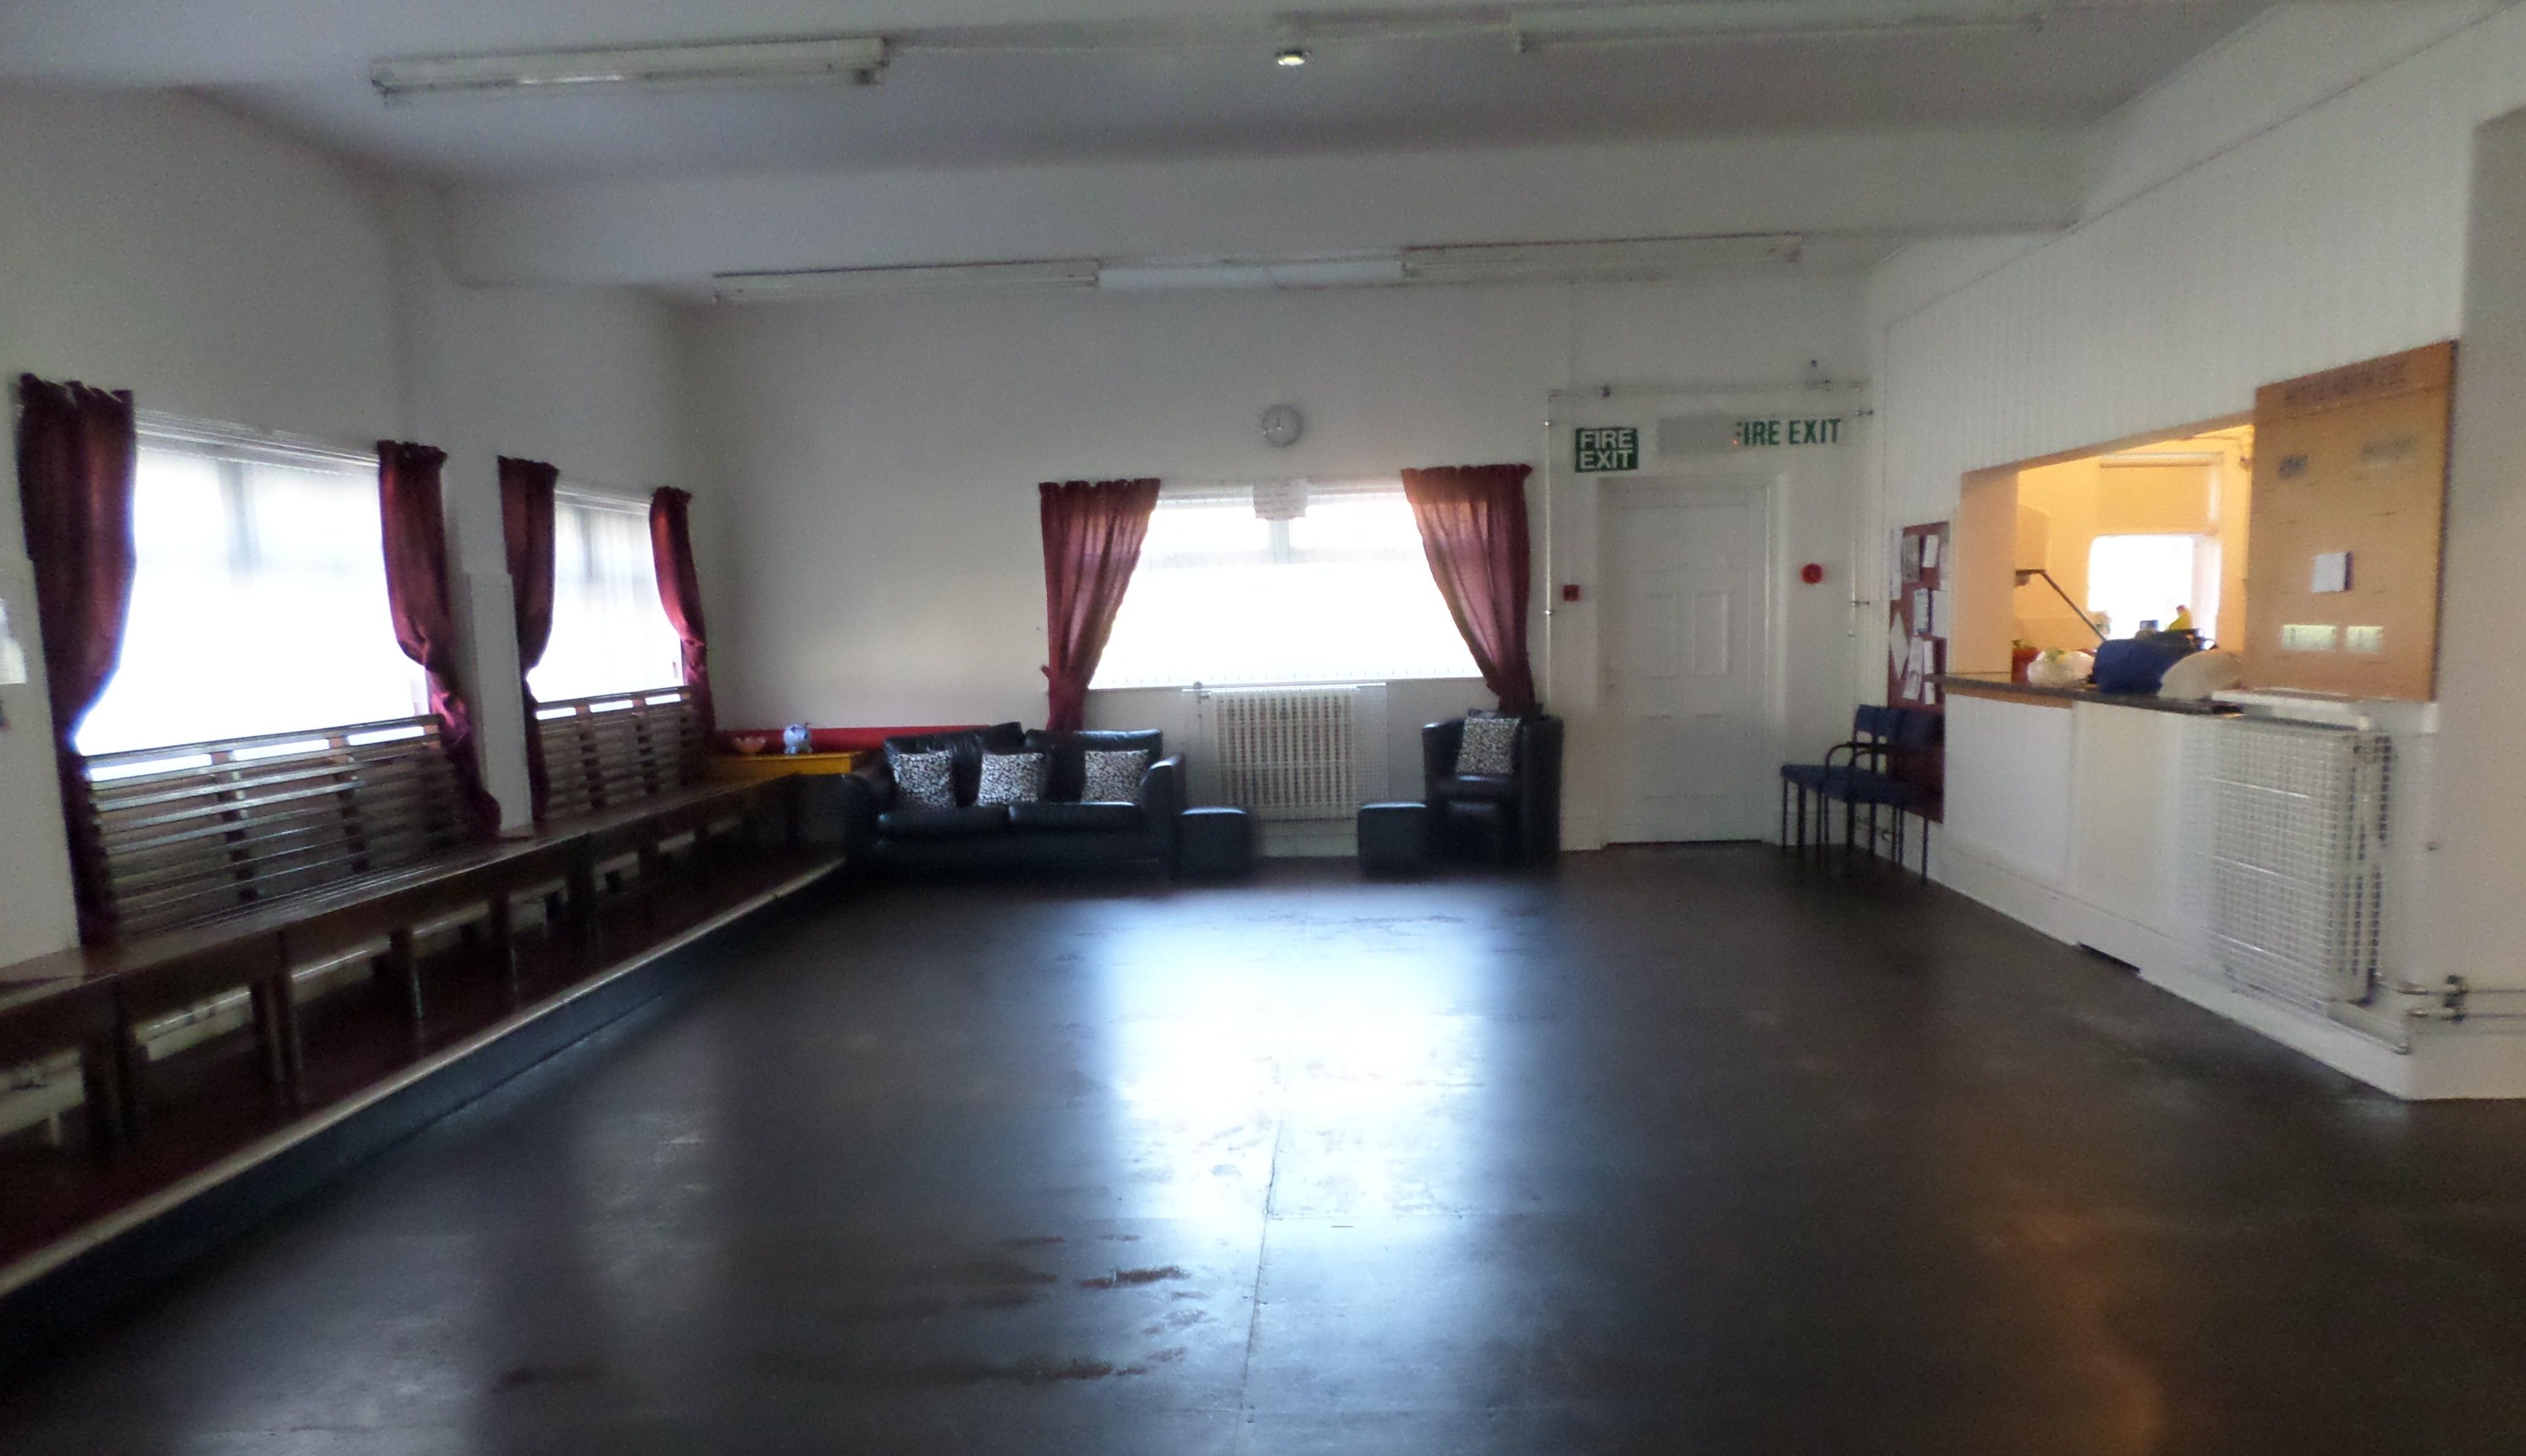 Long Room - 1 Hour